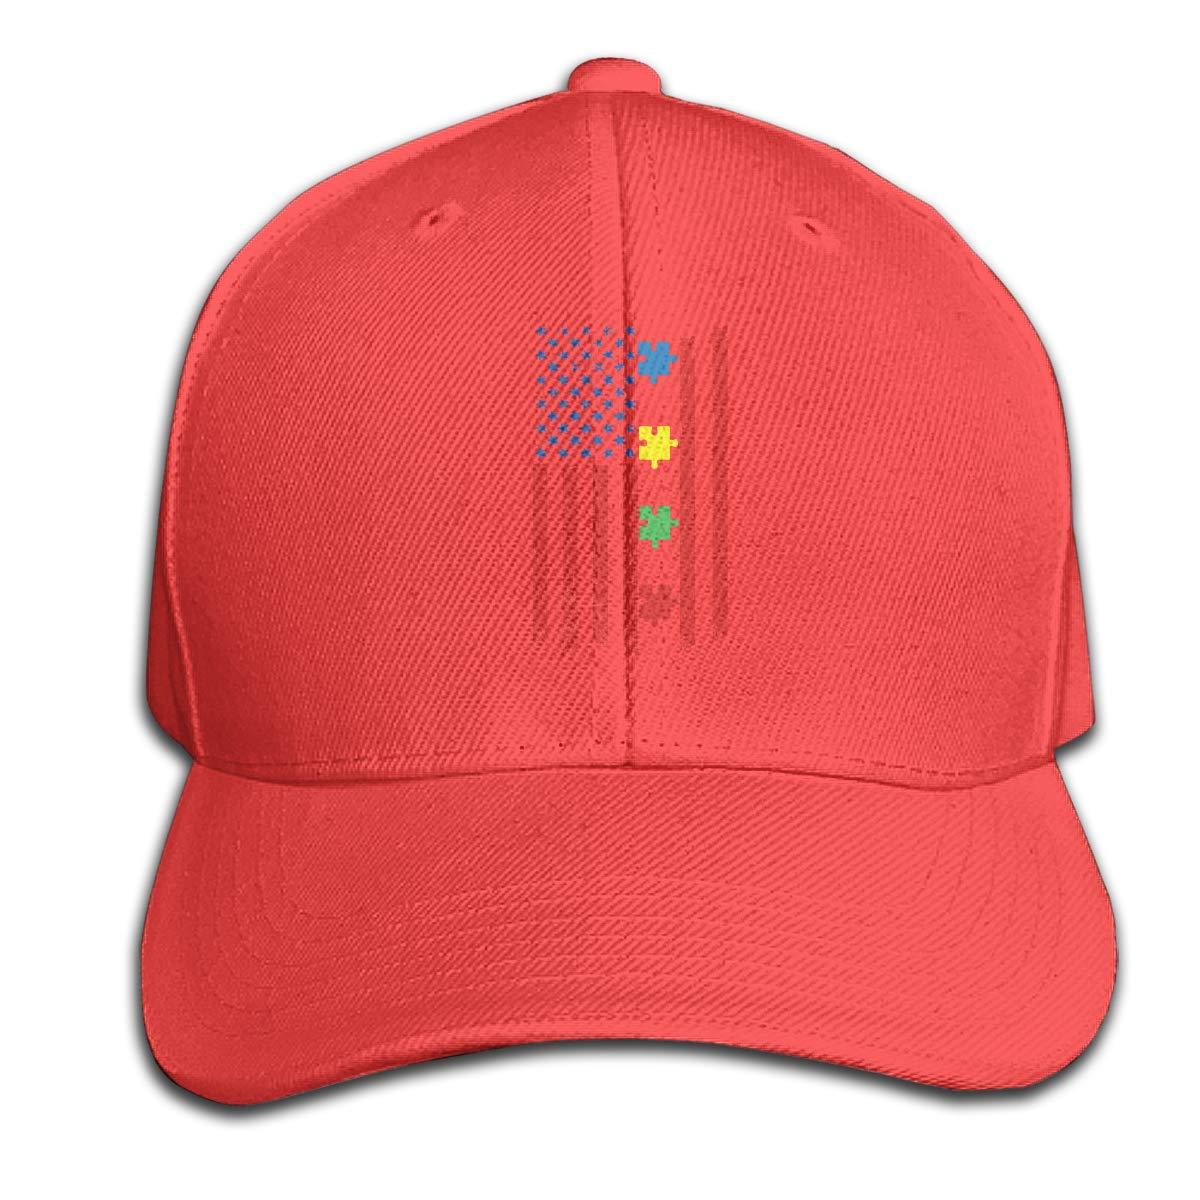 TAOHJS106 Autism Awareness American Flag Unisex Baseball Cap Adjustable Plain Hat for Women Men